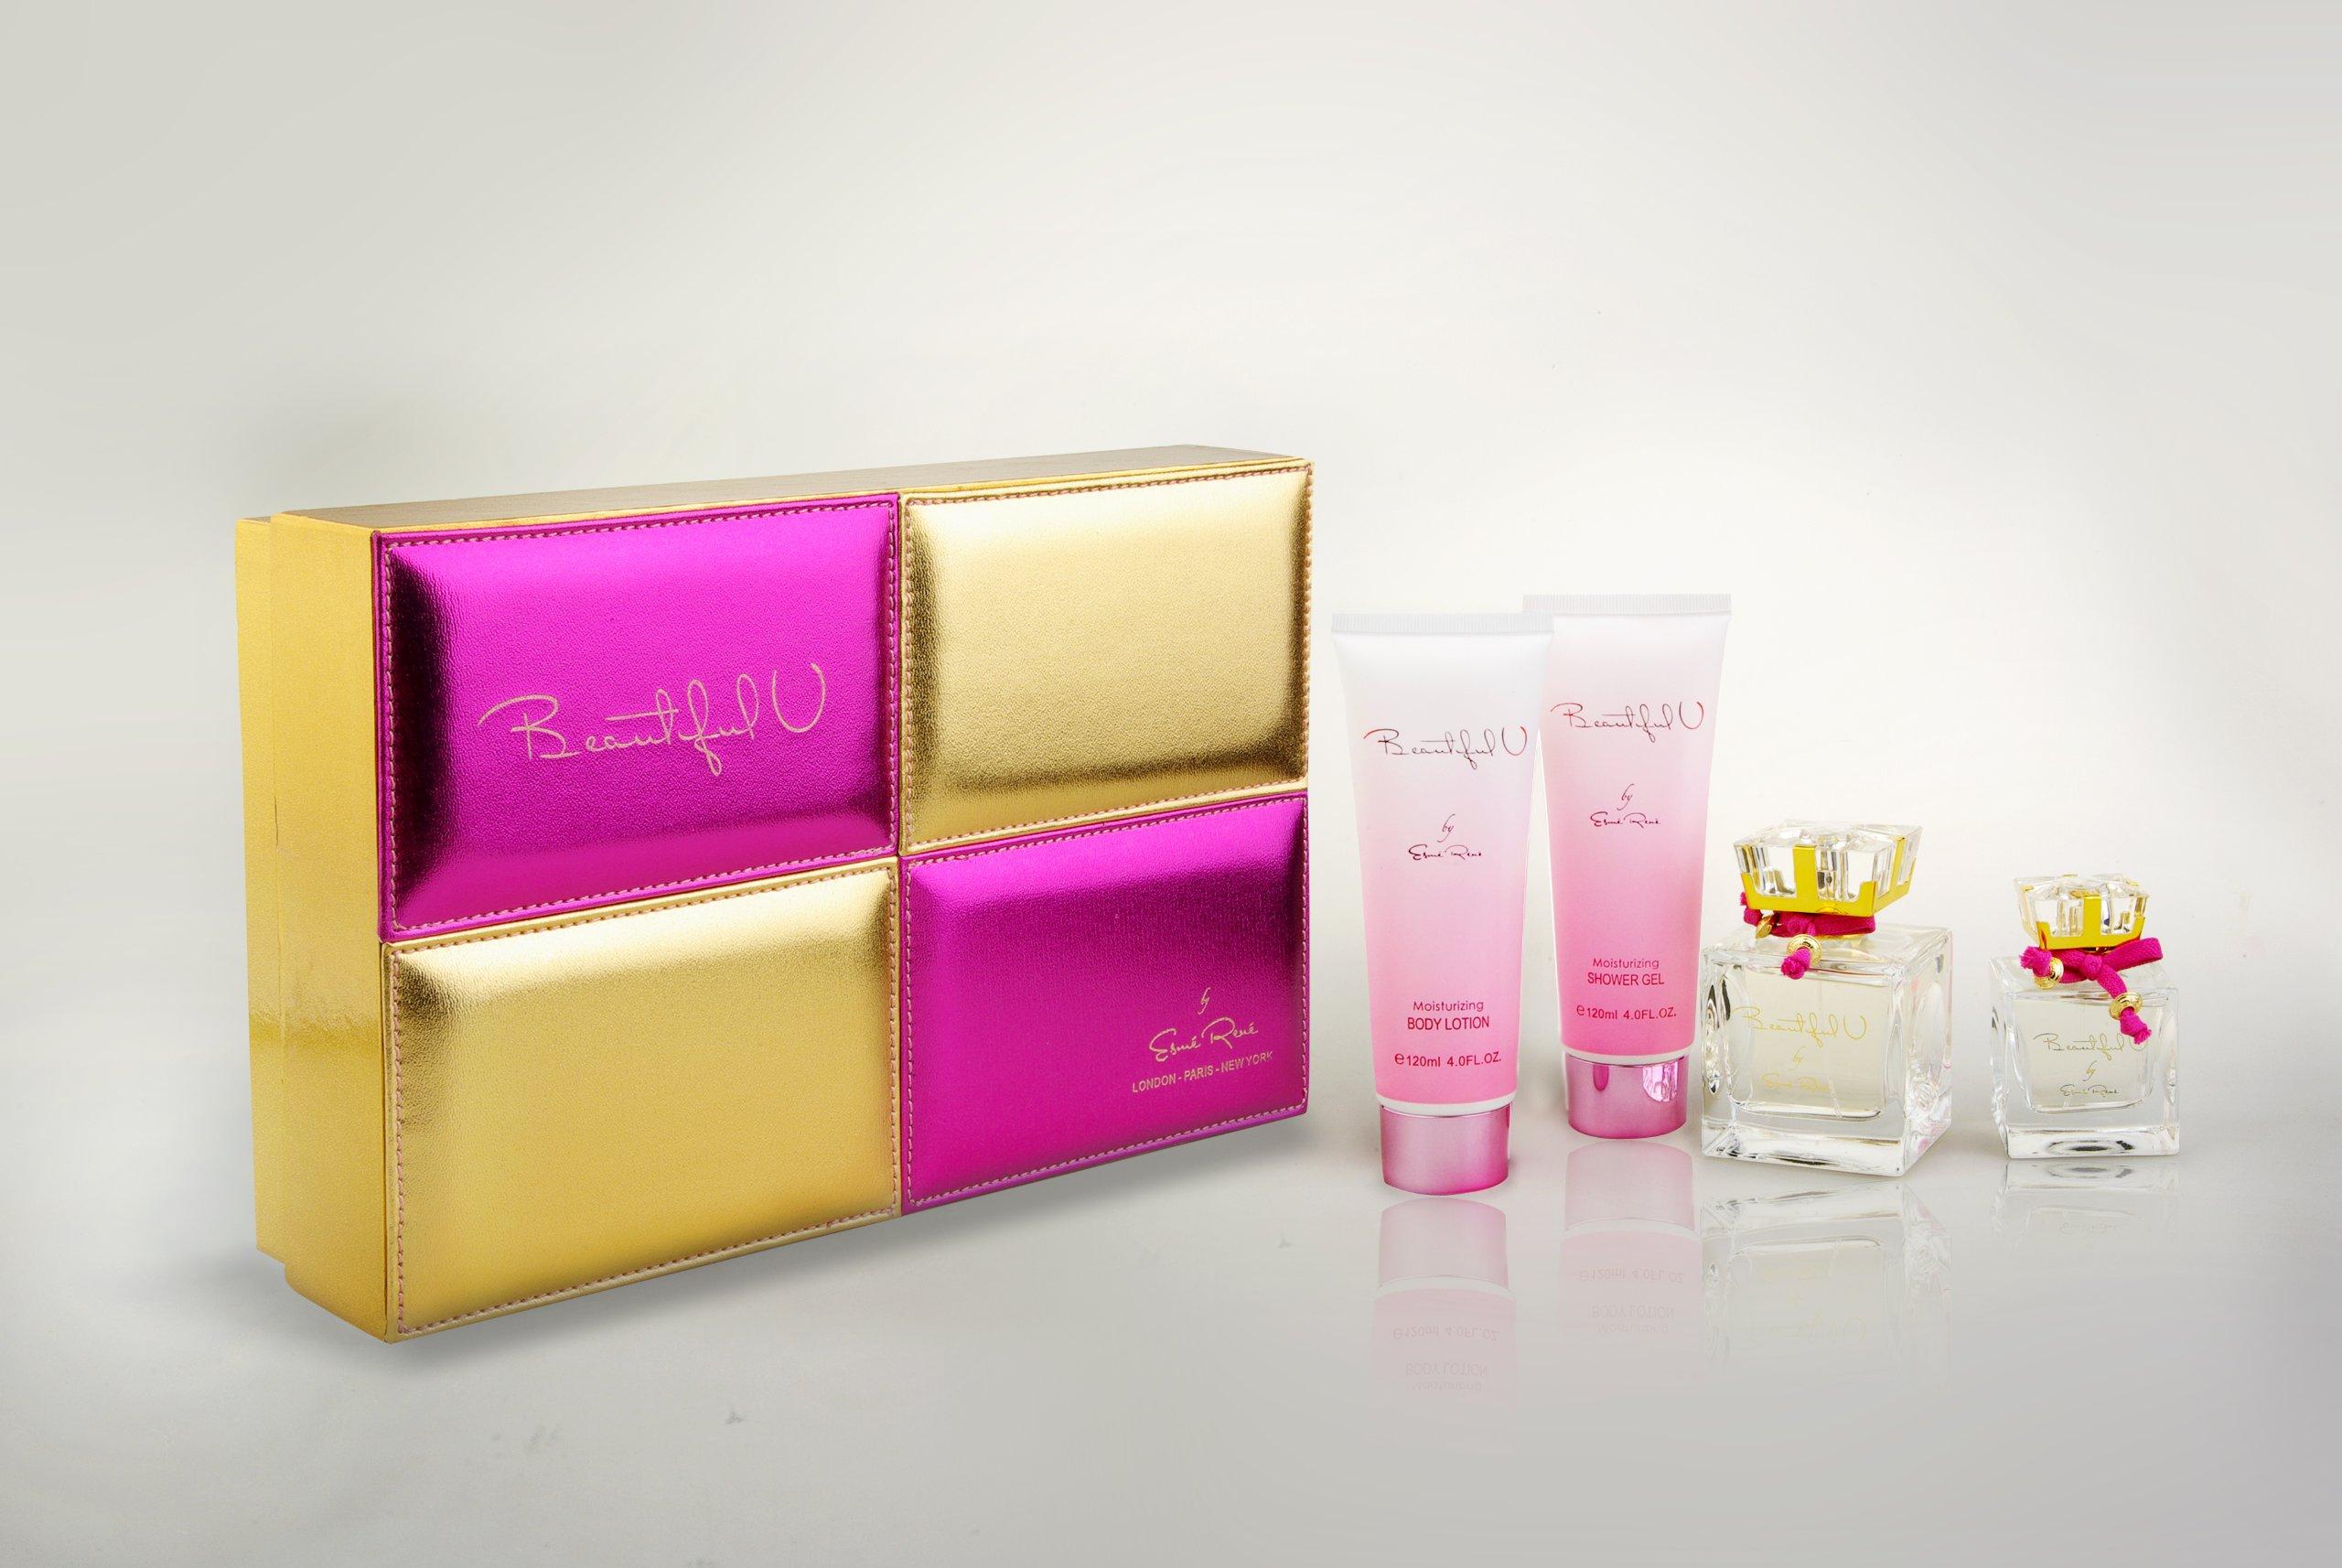 BEAUTIFUL U Esme Rene Women Gift Set Eau de Perfume 3.4oz Spray + 1.7oz OZ Eau de Perfume + 4OZ Lotion + 4oz OZ Shower Gel